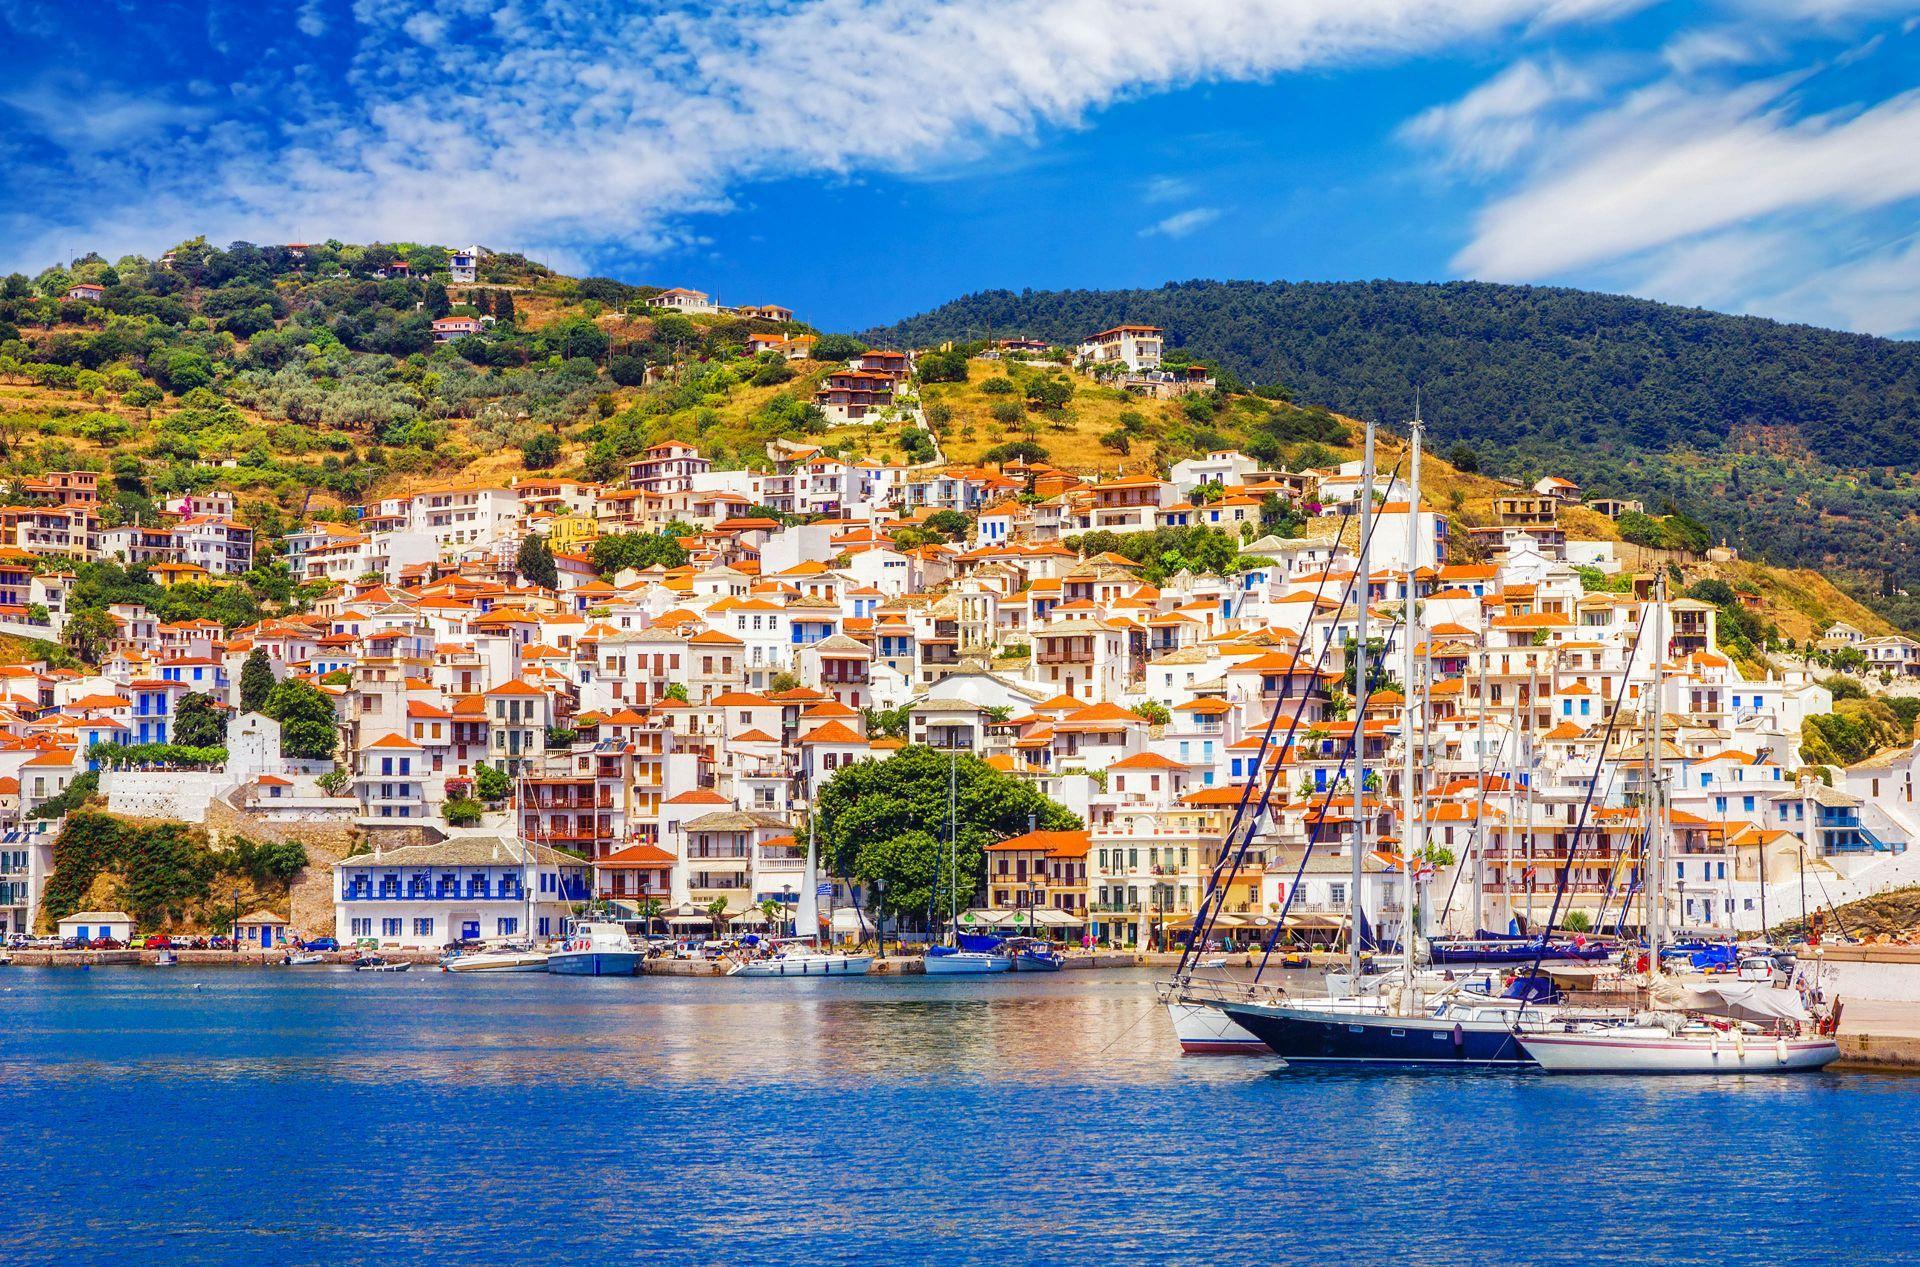 Skopelos island: Town